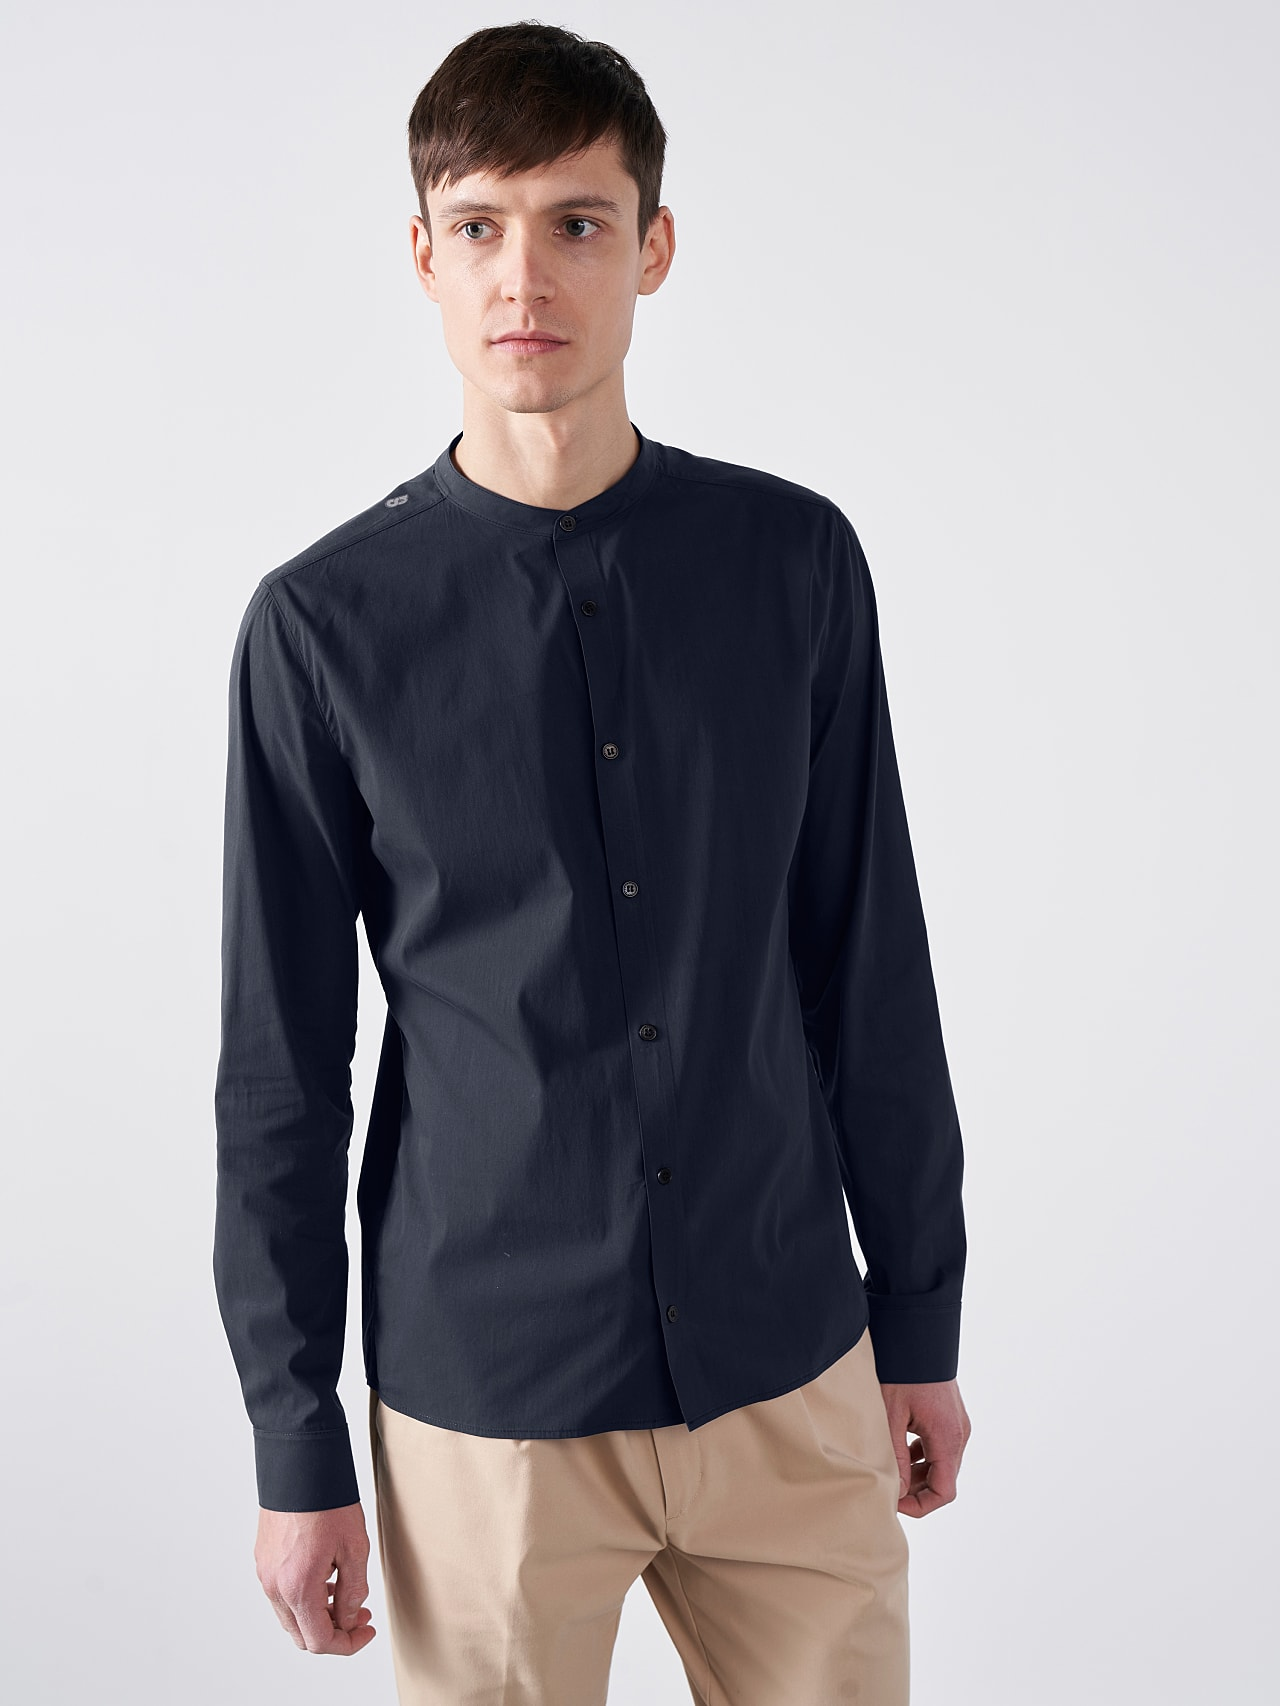 WIDT V9.Y5.01 Stand-Up Collar Cotton-Stretch Shirt navy Model shot Alpha Tauri